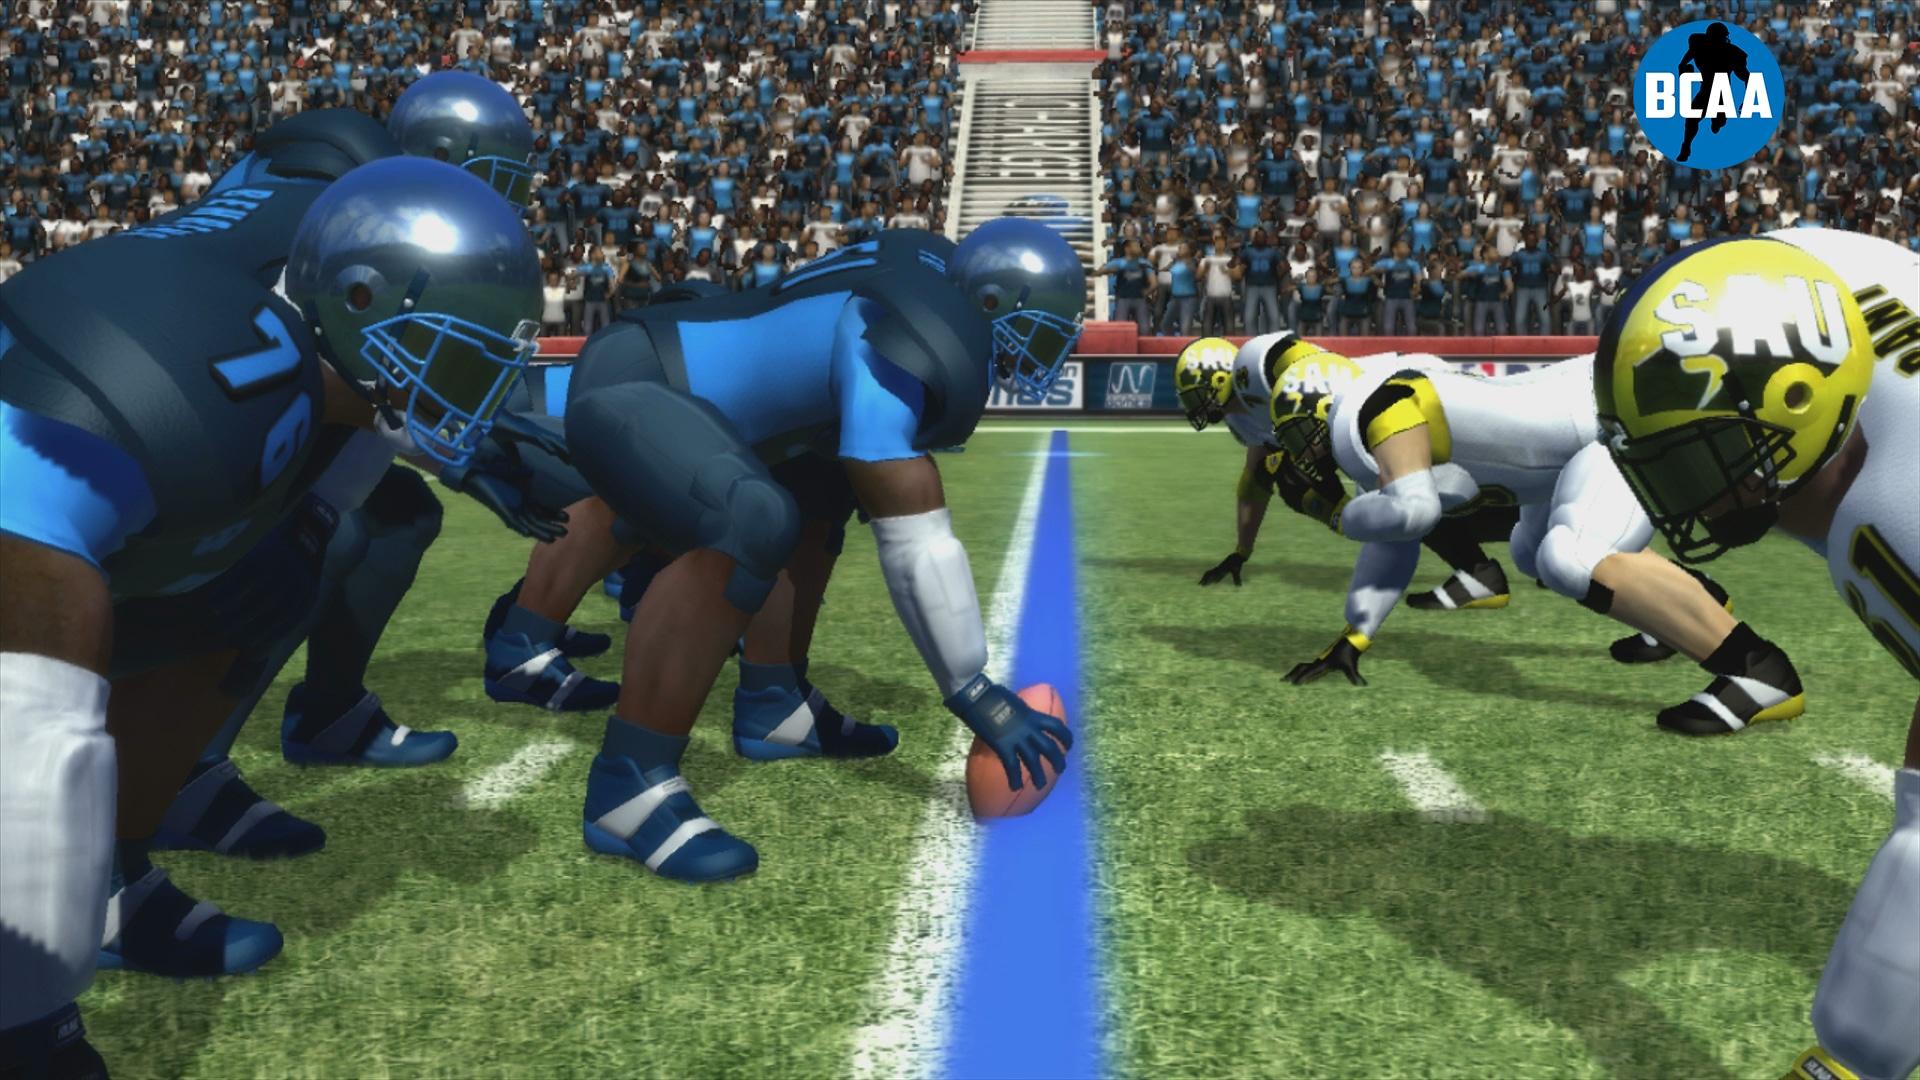 Backbreaker College Football League Teams Decided